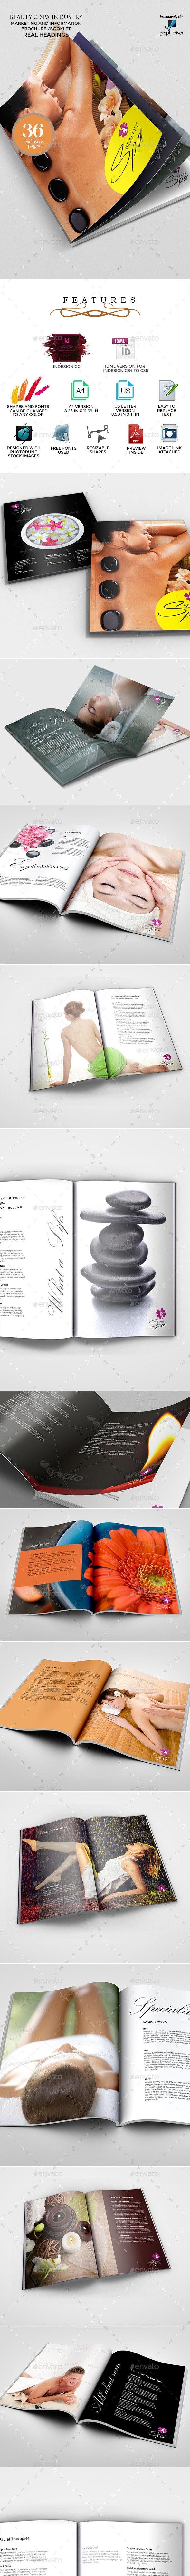 Beauty Salon and Spa Service Brochure - Informational Brochures